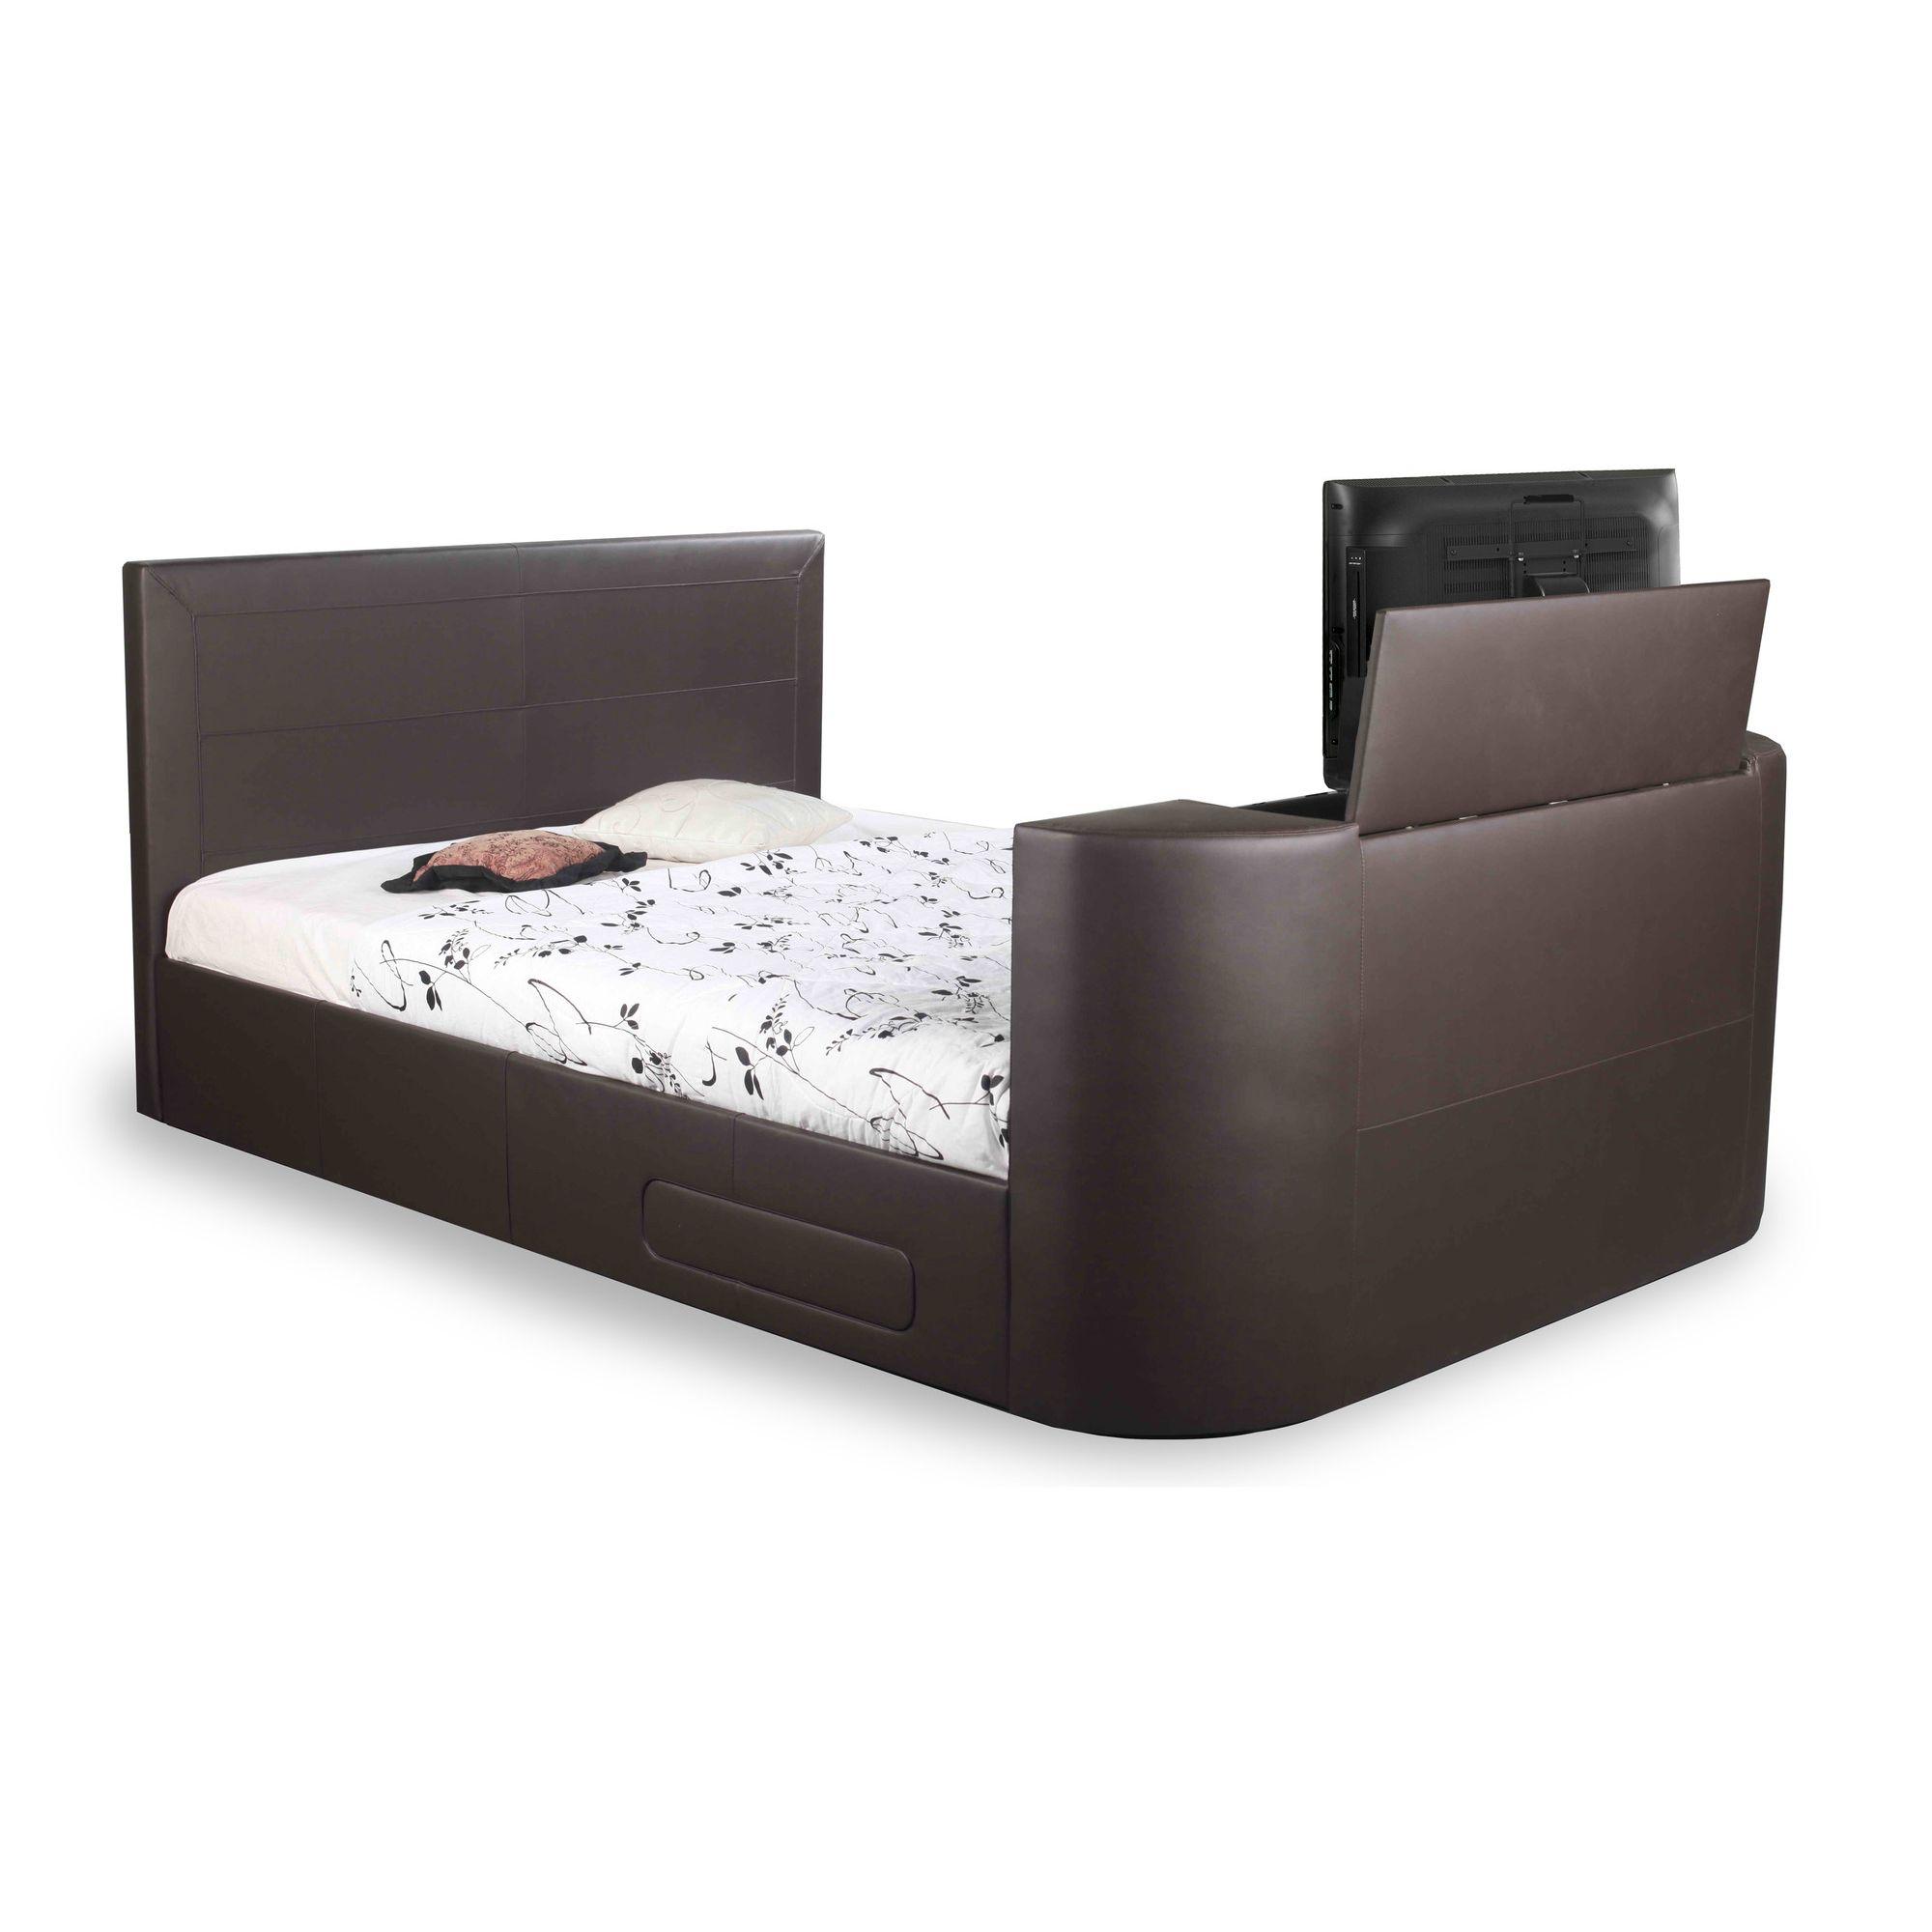 Altruna Sophia TV Bed - Super King at Tescos Direct